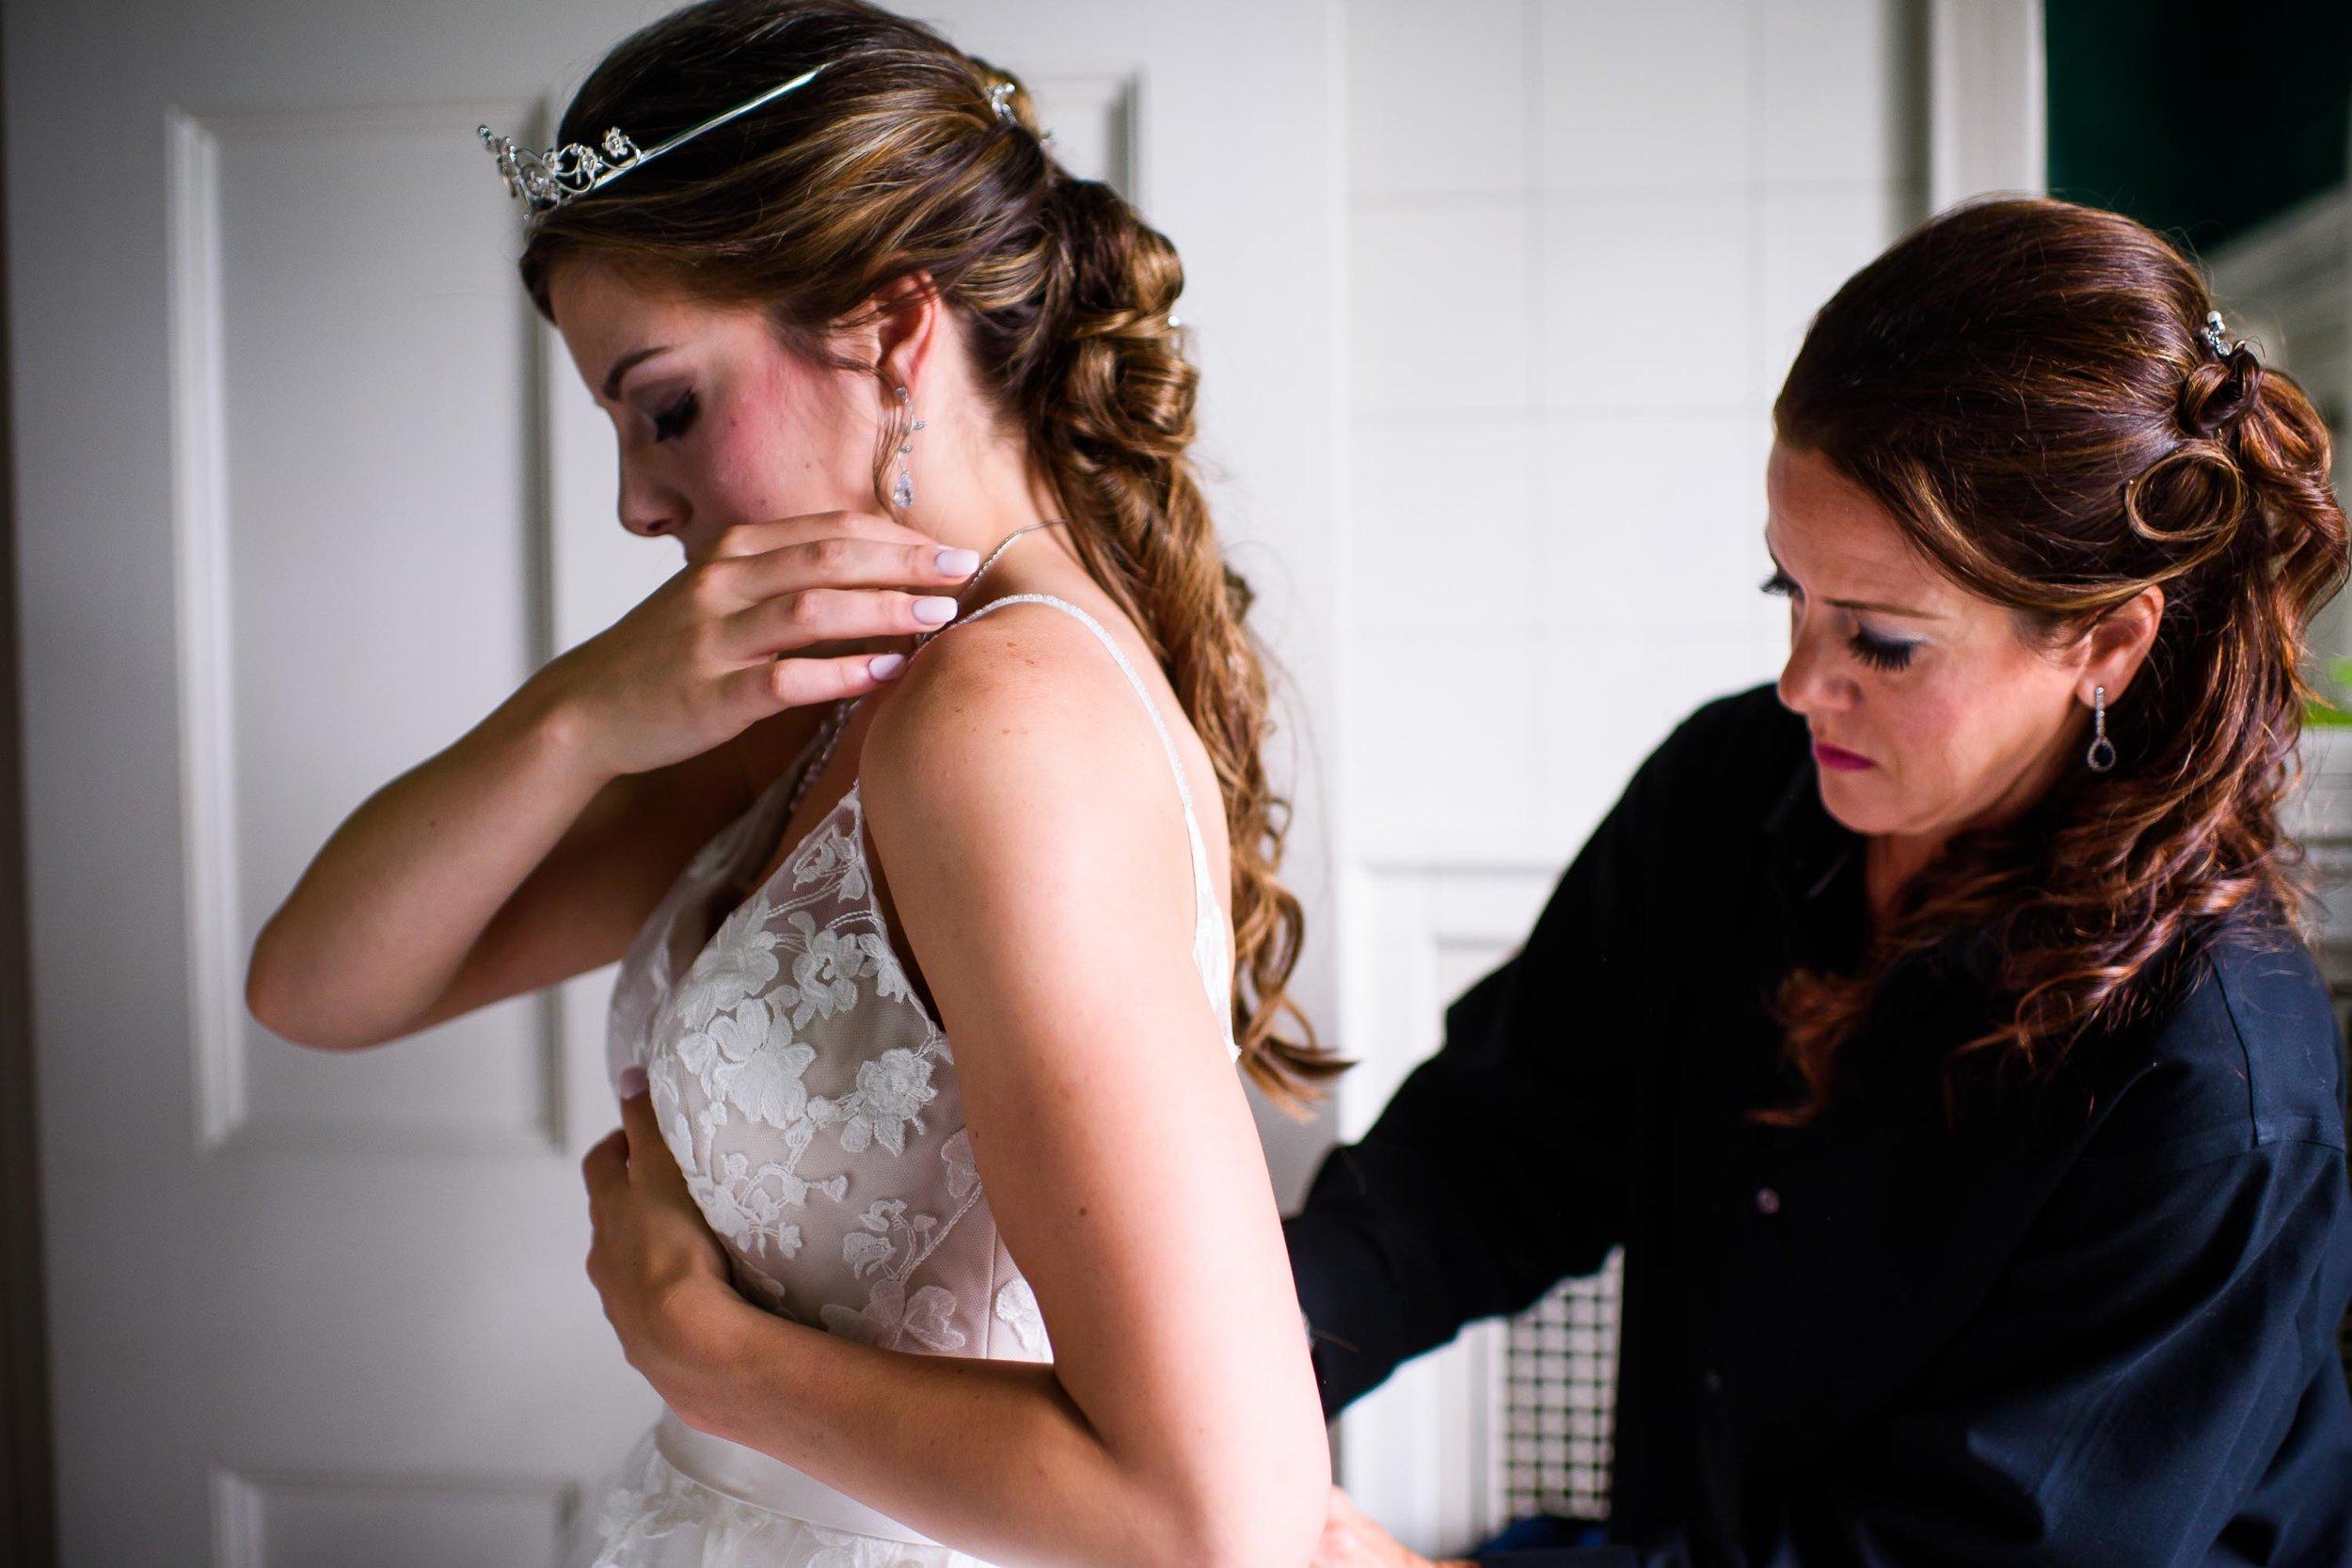 thornewood castle wedding 2.jpg